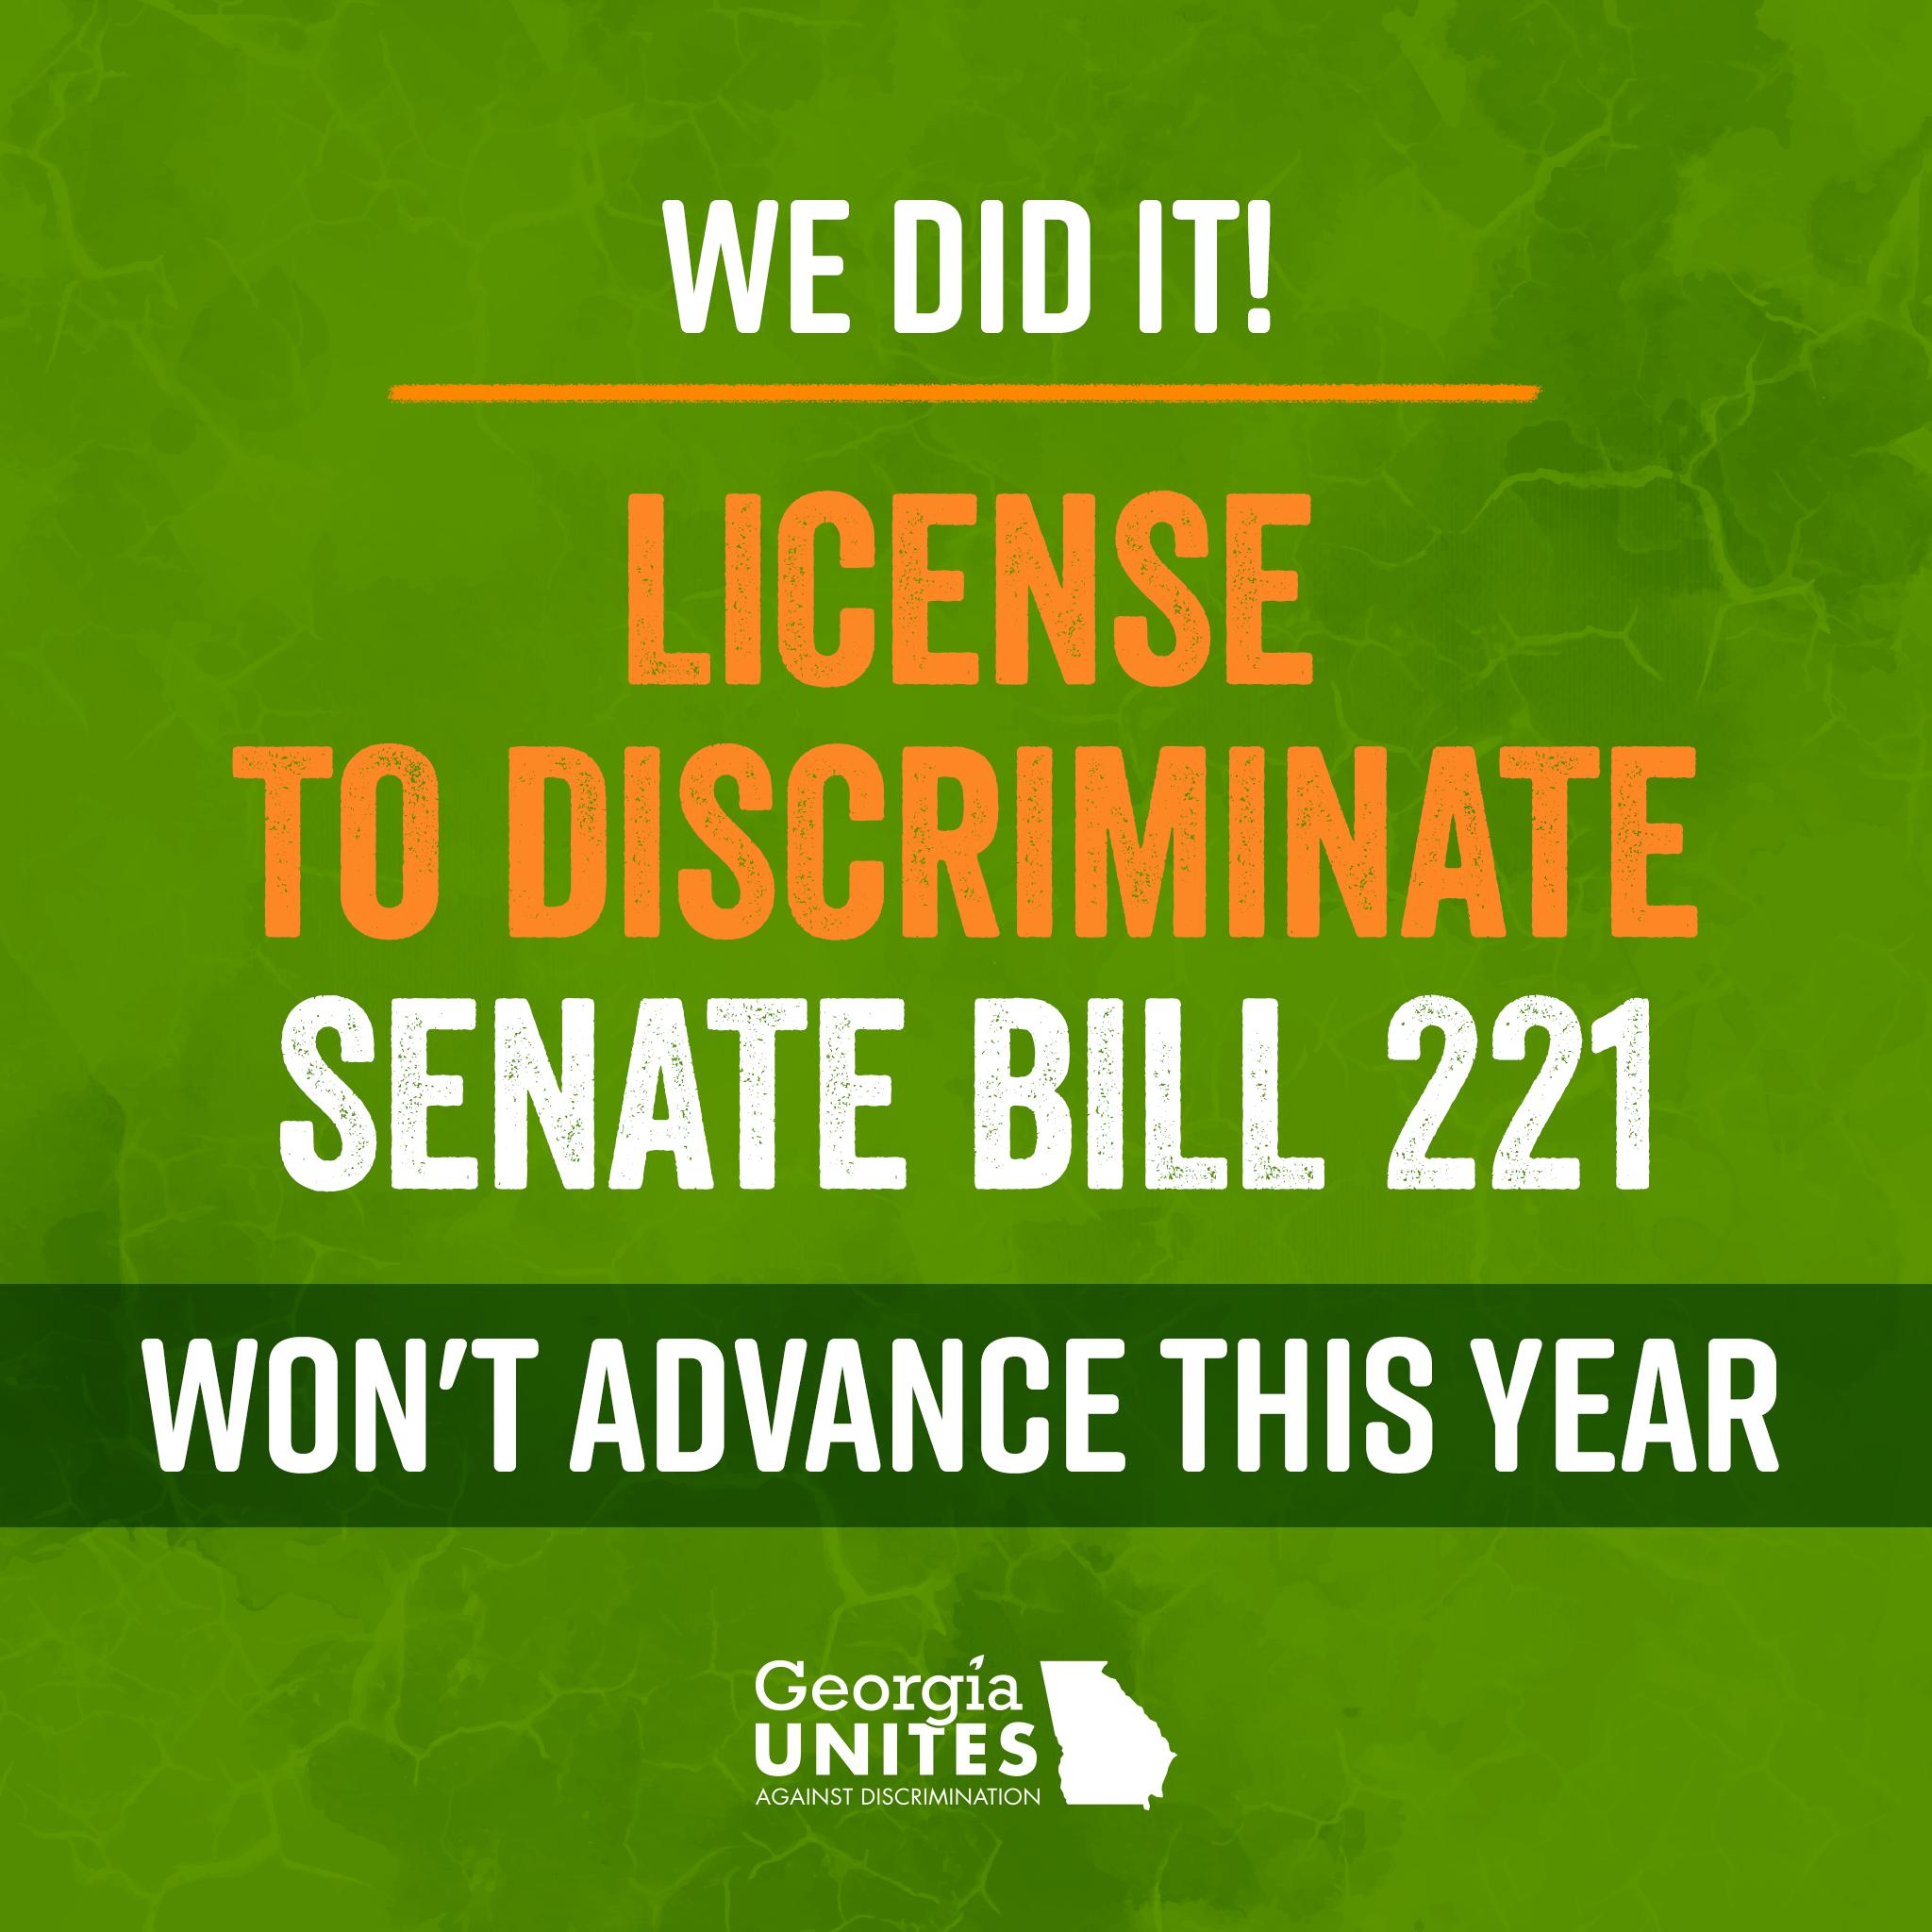 Senate Bill 221 Blocked for 2019, But The Threat of Anti-LGBTQ Amendments Remains